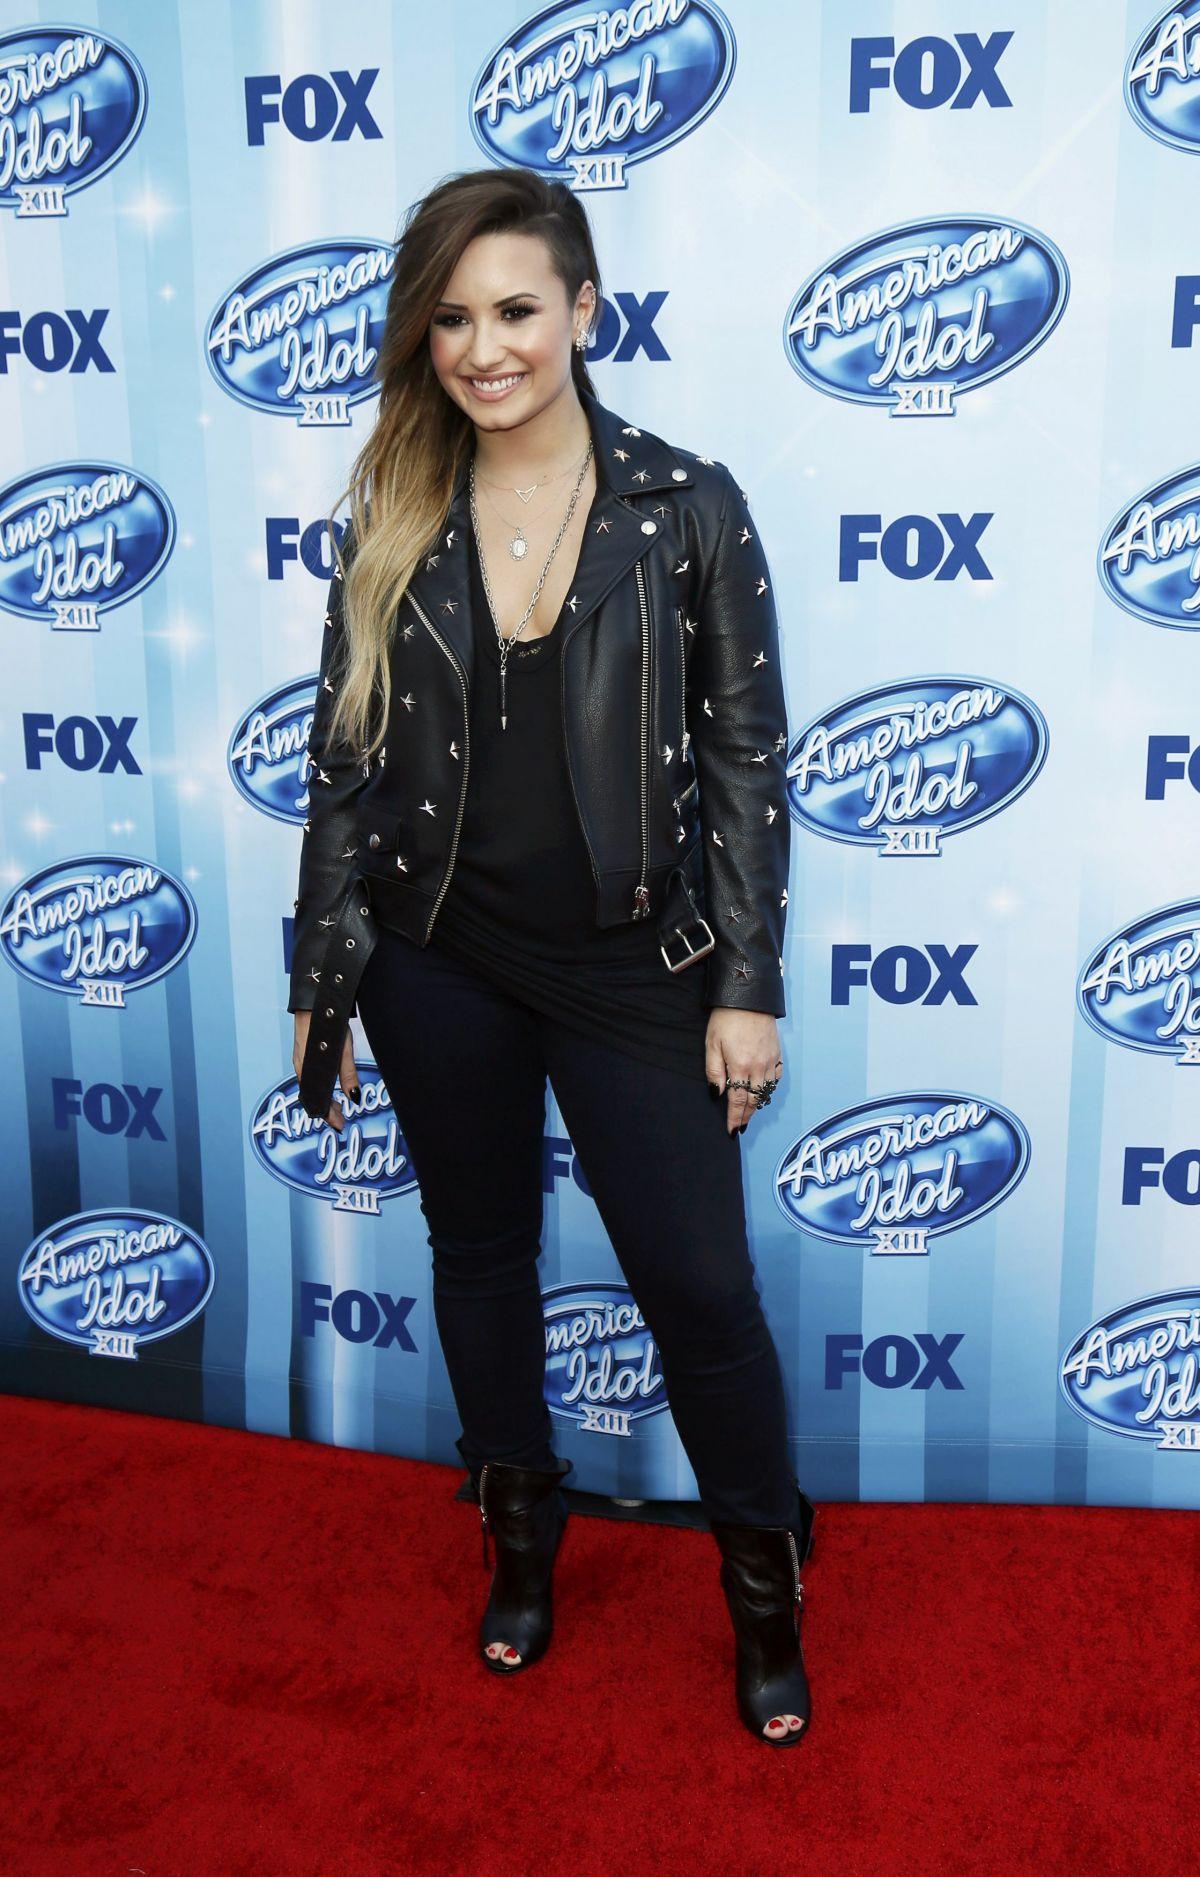 DEMI LOVATO at American Idol 2014 Season Finale in Los Angeles